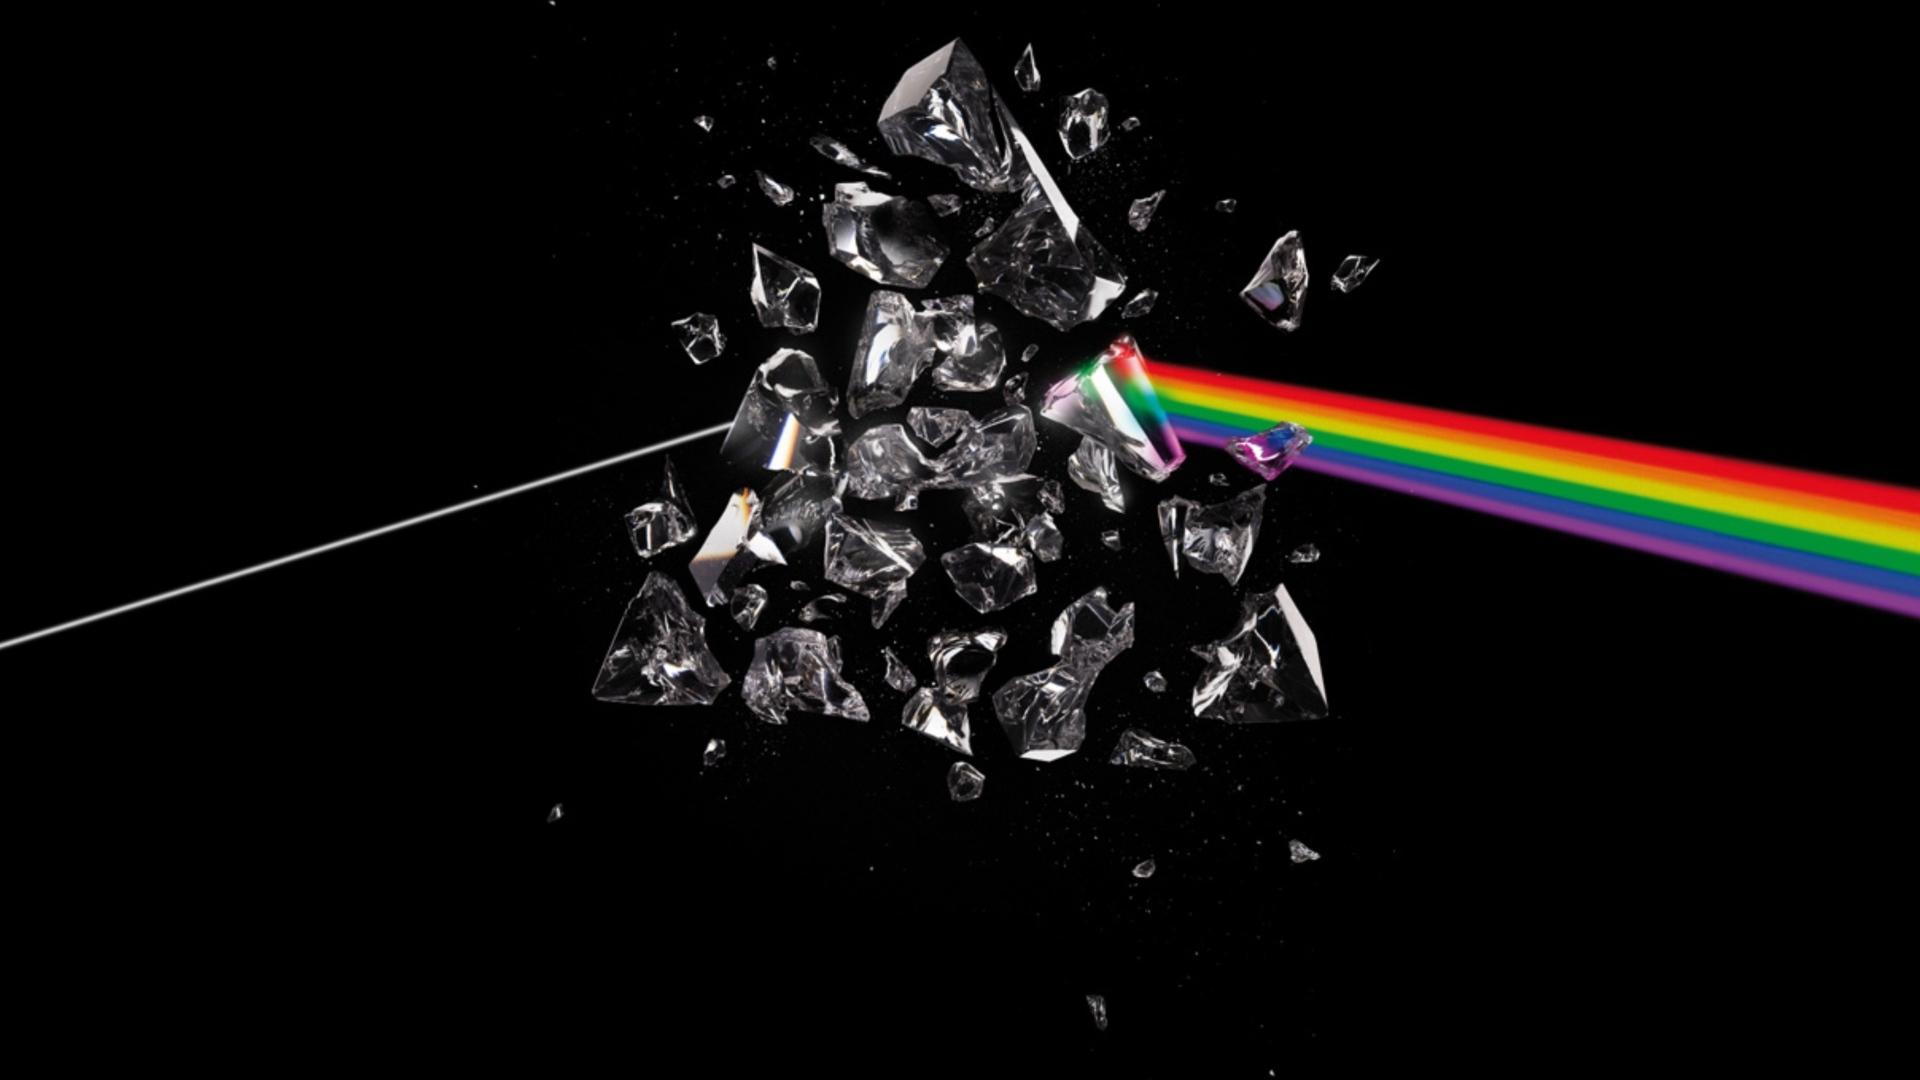 45 Pink Floyd Hd Wallpapers 1080p On Wallpapersafari